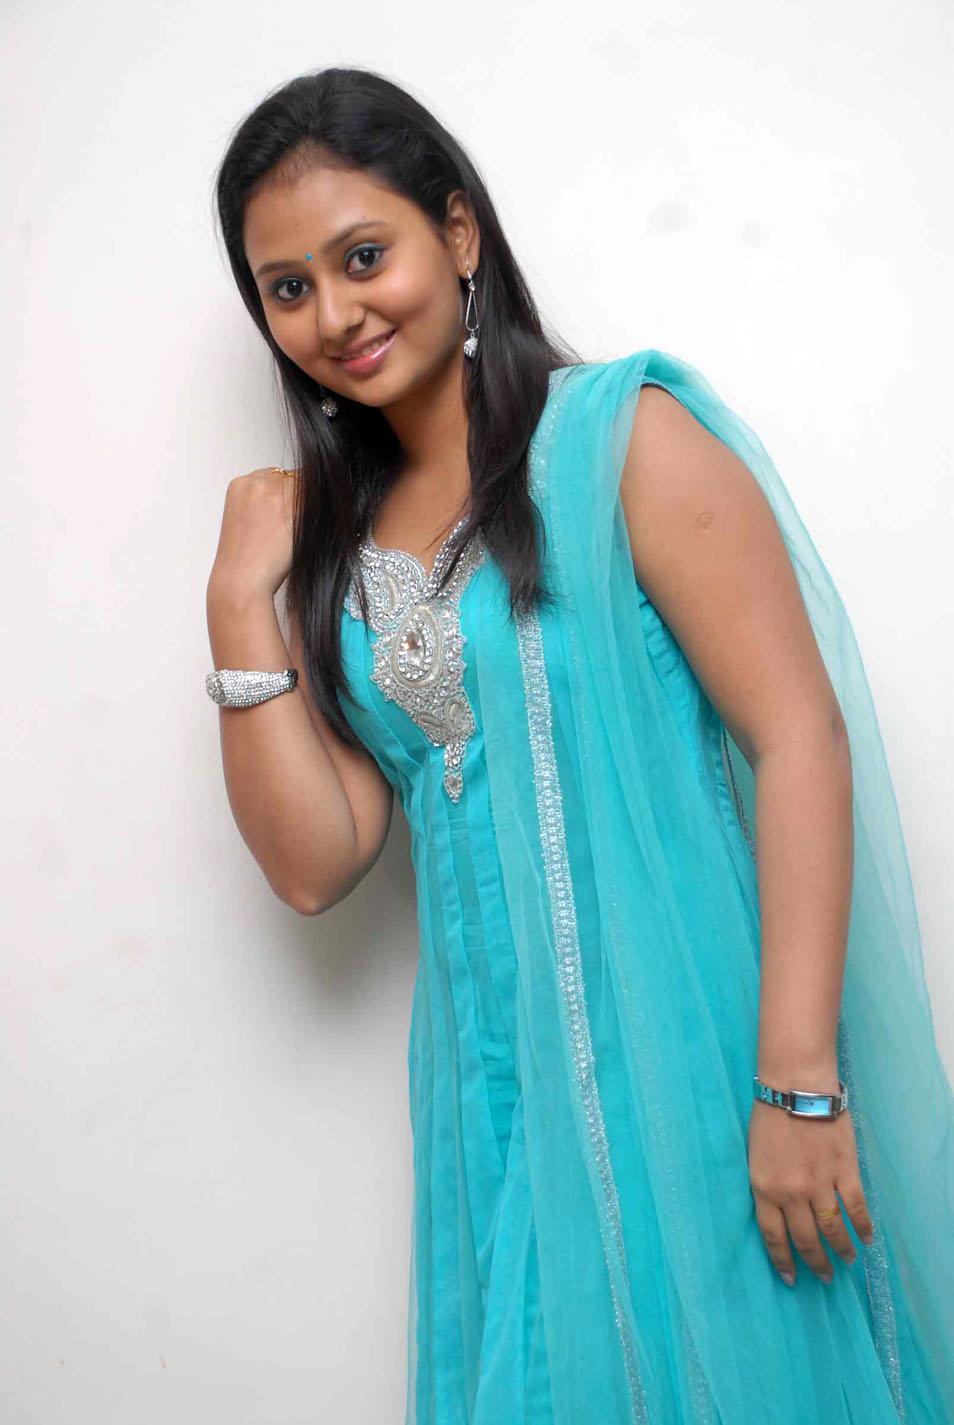 Kannada Actress Amulya Hot Hd Photo Gallery - Cap-7441